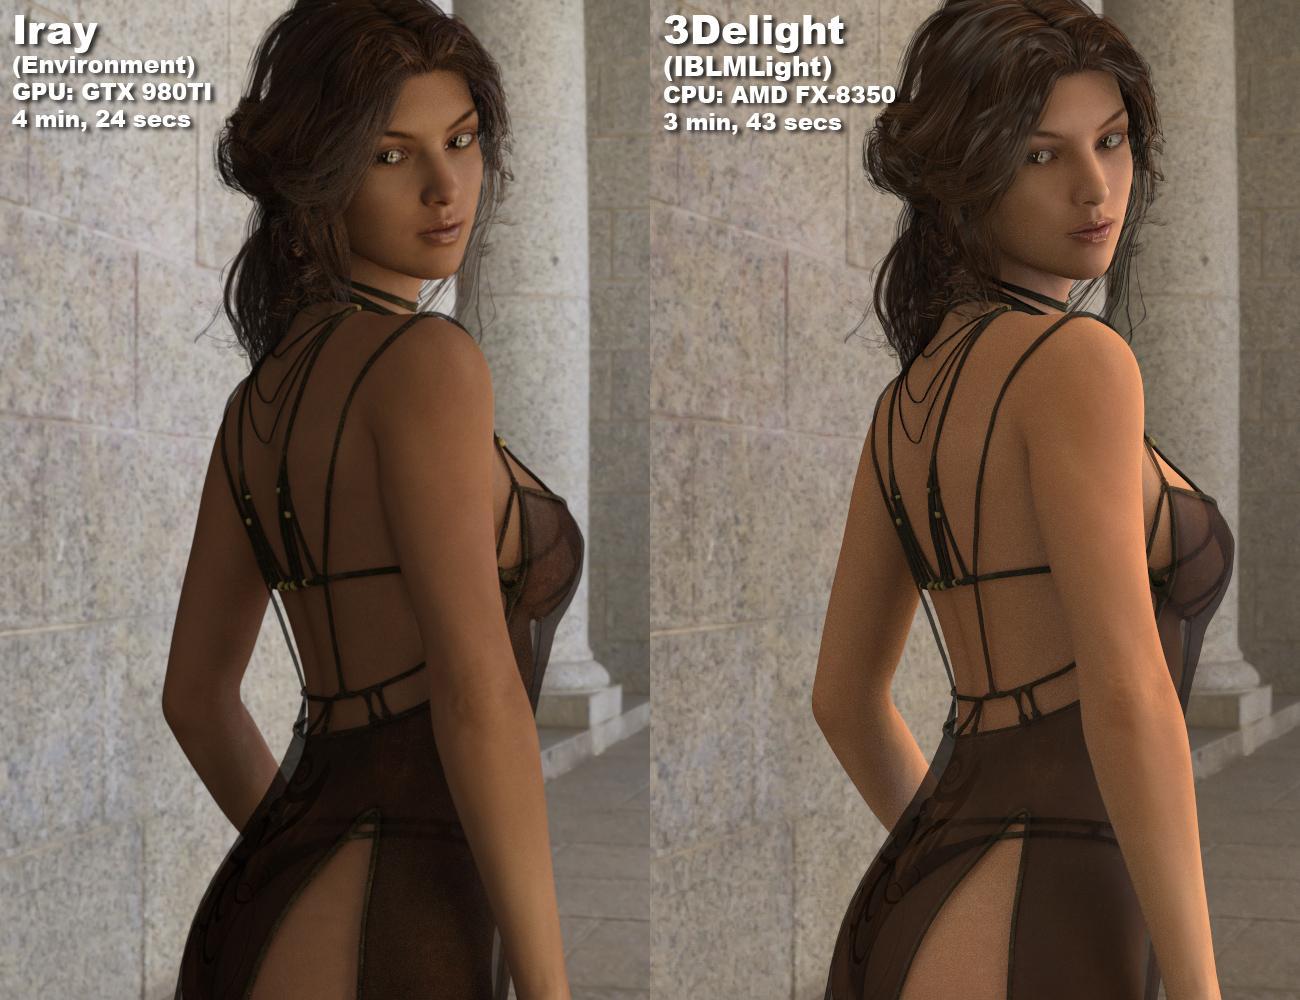 IBL Master: Compare Iray to 3Delight